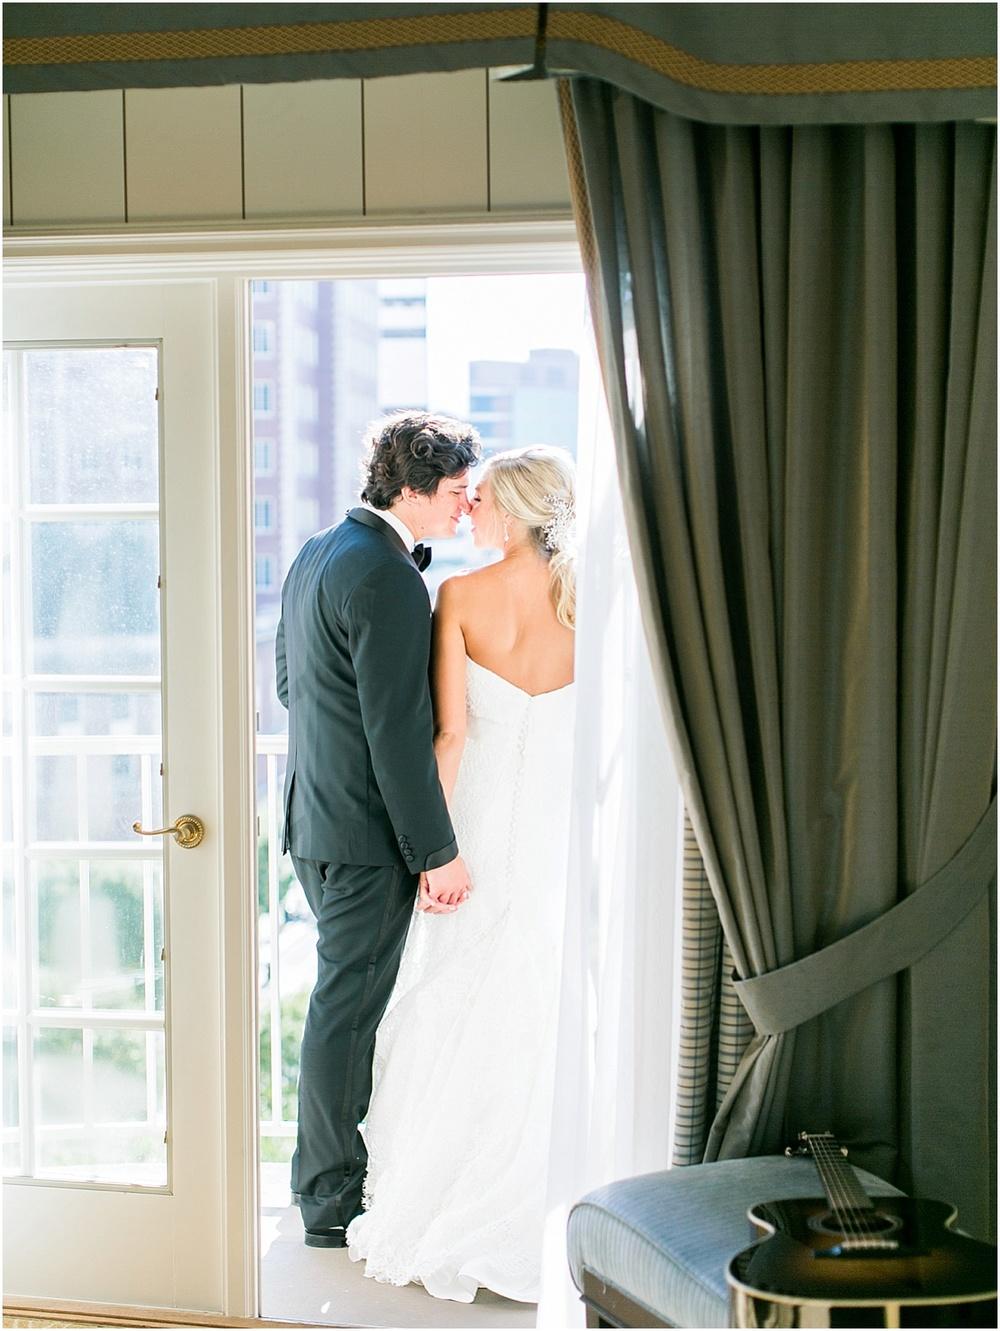 St_Louis_Wedding_Fine_Art_Film_Photographer_Jordan_Brittley_(www.jordanbrittley.com)_0030.jpg